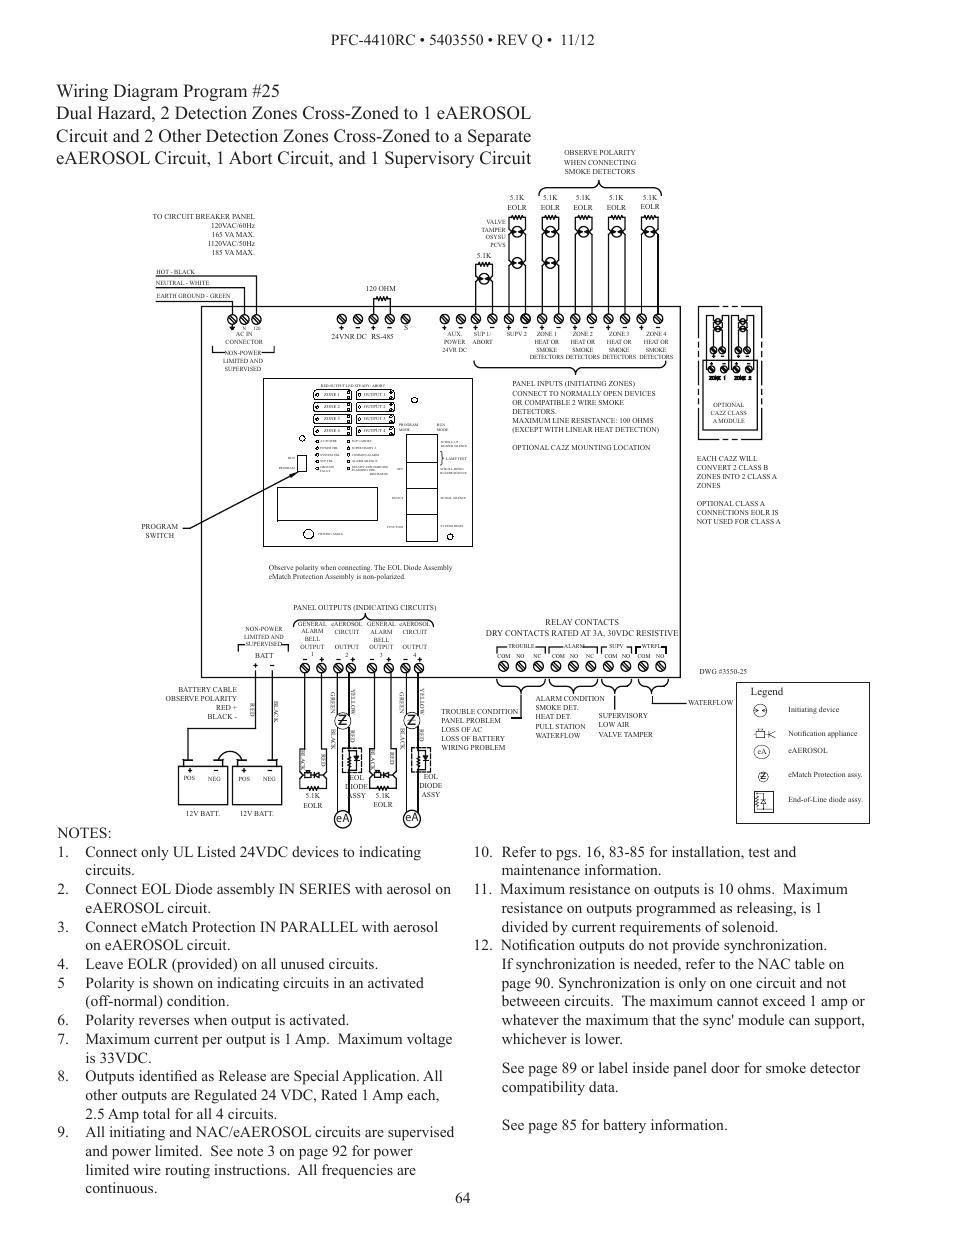 pfc wiring diagram 1986 chevy diesel alternator wiring diagram potter pfc-4410rc user manual   page 64 / 99 #3